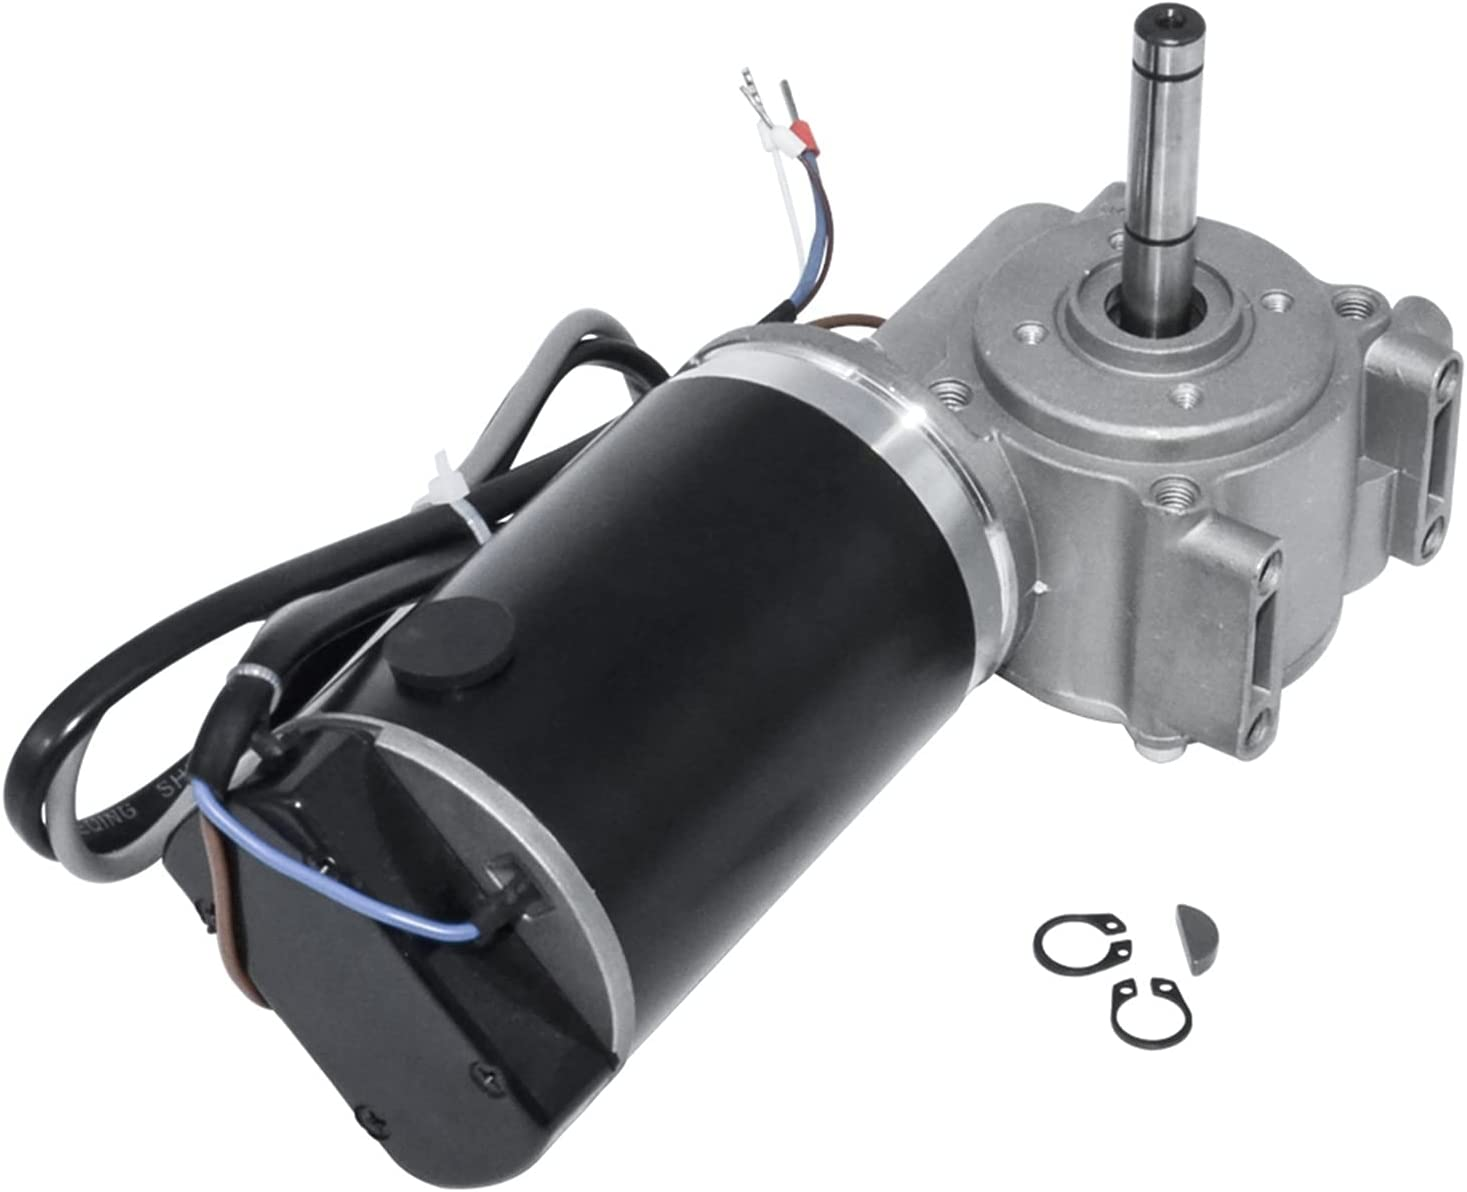 1 PC DC 24V 60W / 100W Motor de Engranaje de Gusano Encoder Inteligente Motor de Puerta eléctrica para hoteles Automático Puerta (Speed(RPM) : 60W 250RPM, Voltage(V) : 24V)